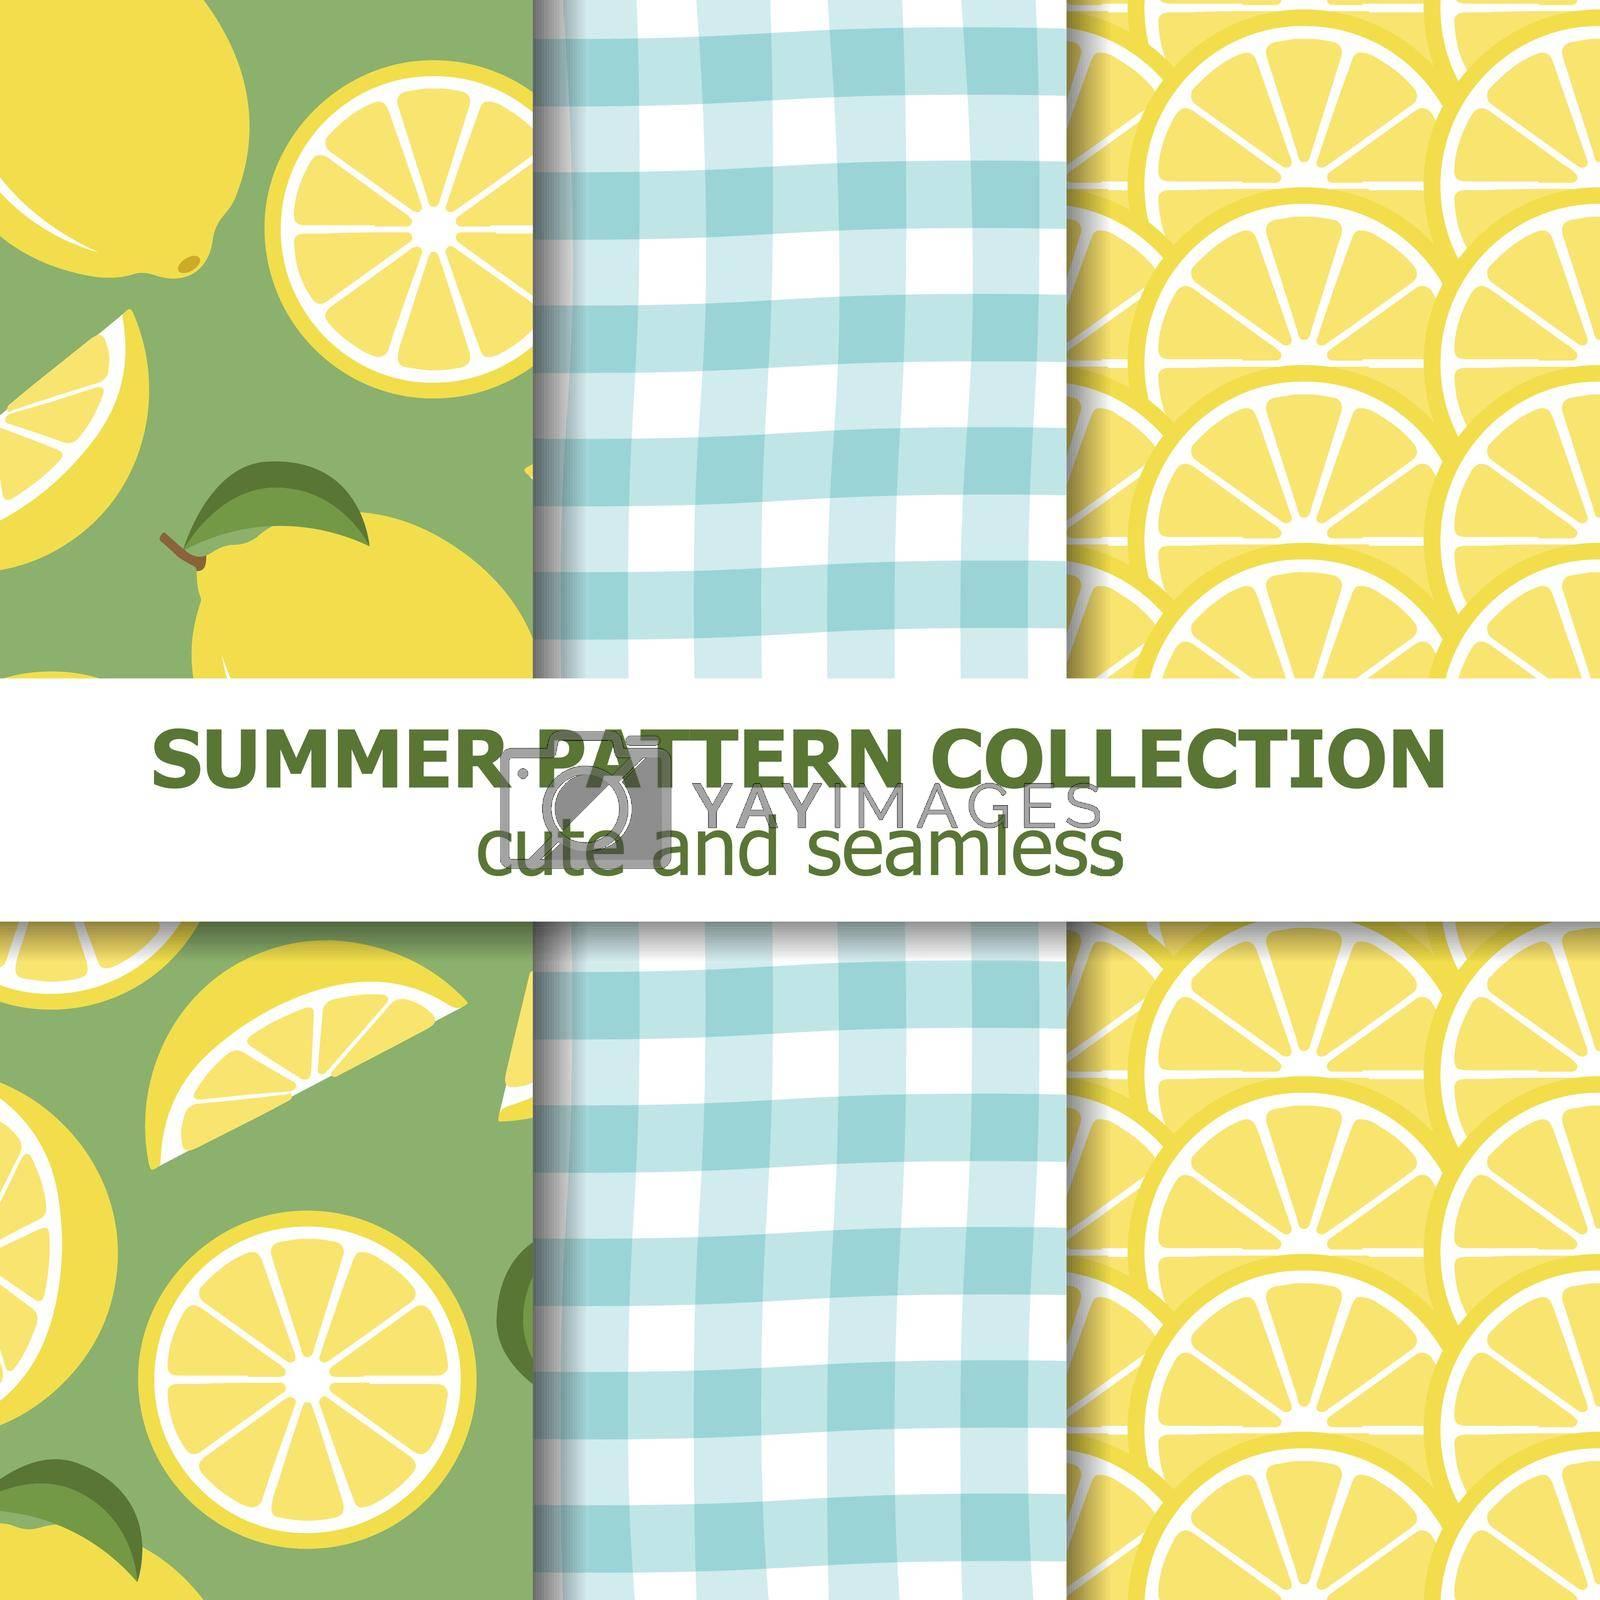 Cute summer pattern collection. Lemon theme. Summer banner. Vector